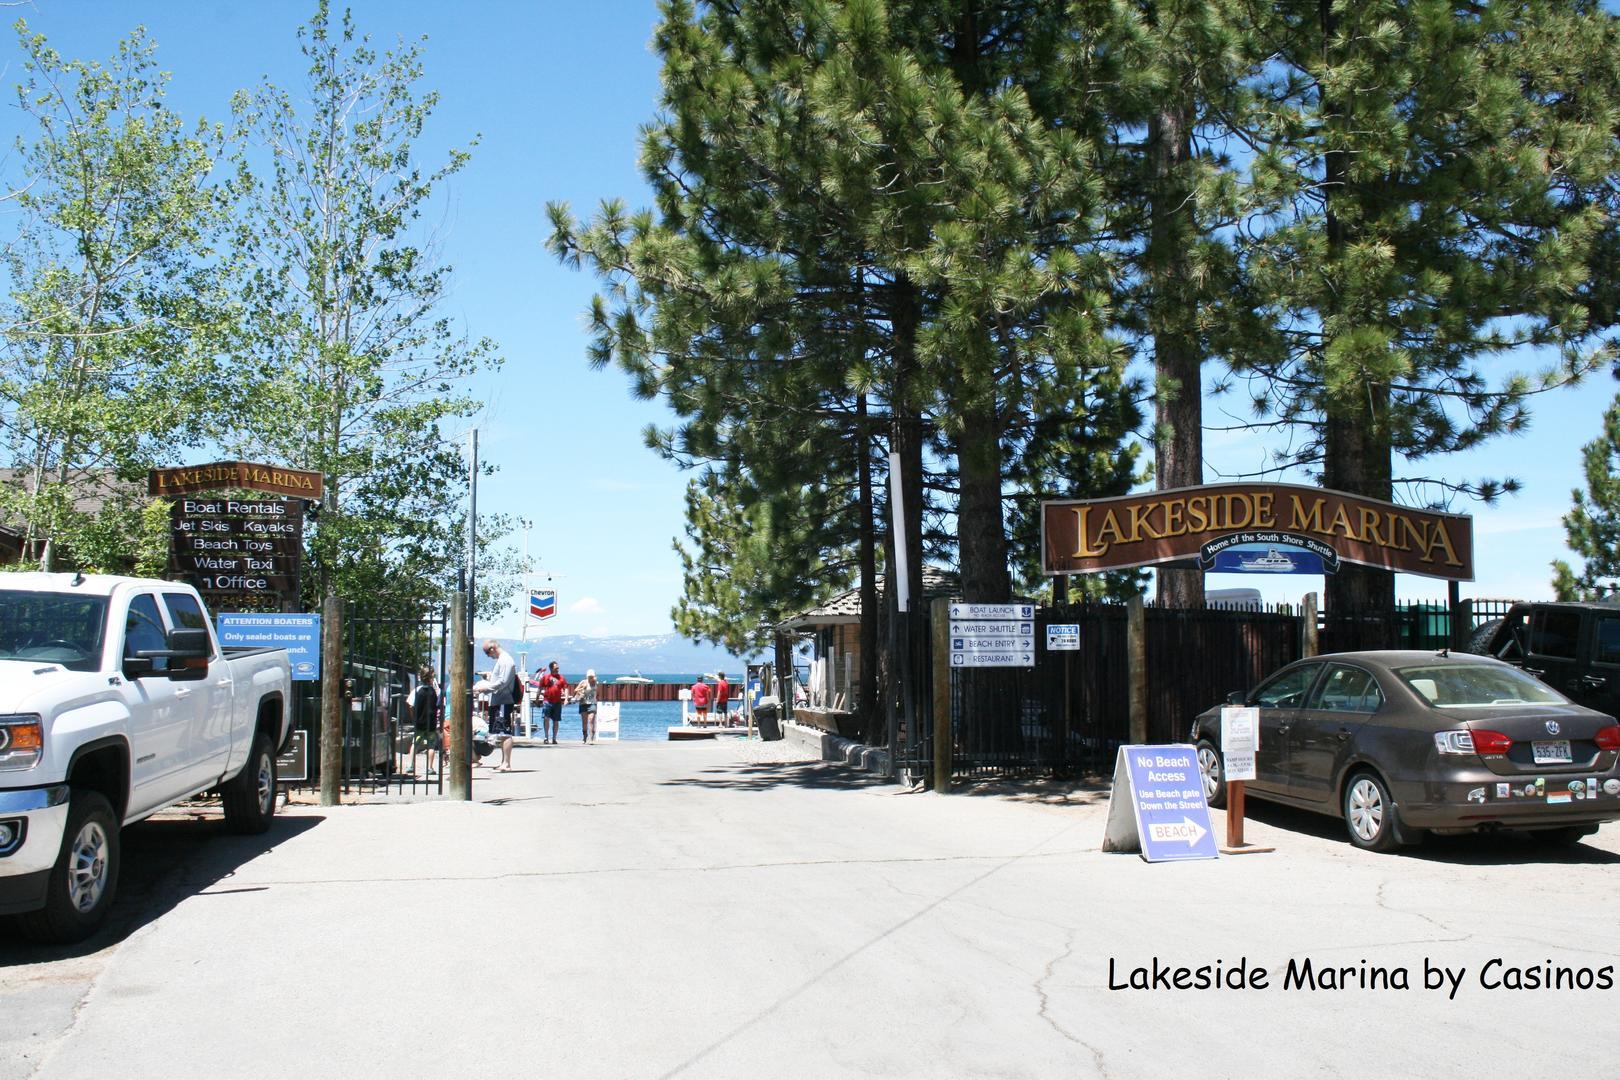 hnc0626 Lakeside Marina